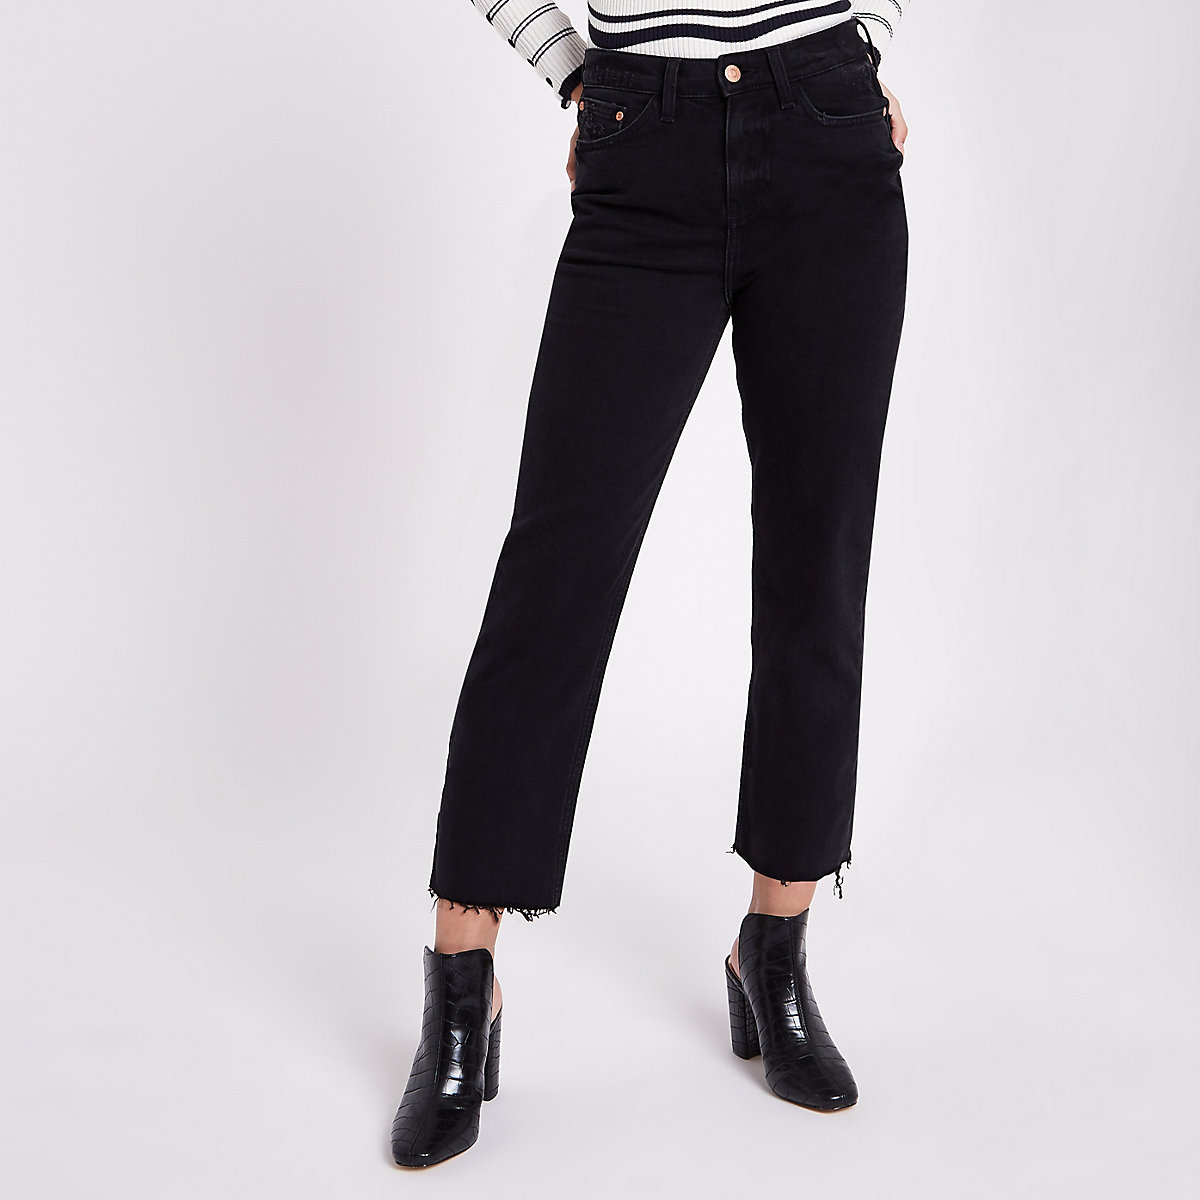 Petite black frayed Bella straight leg jeans